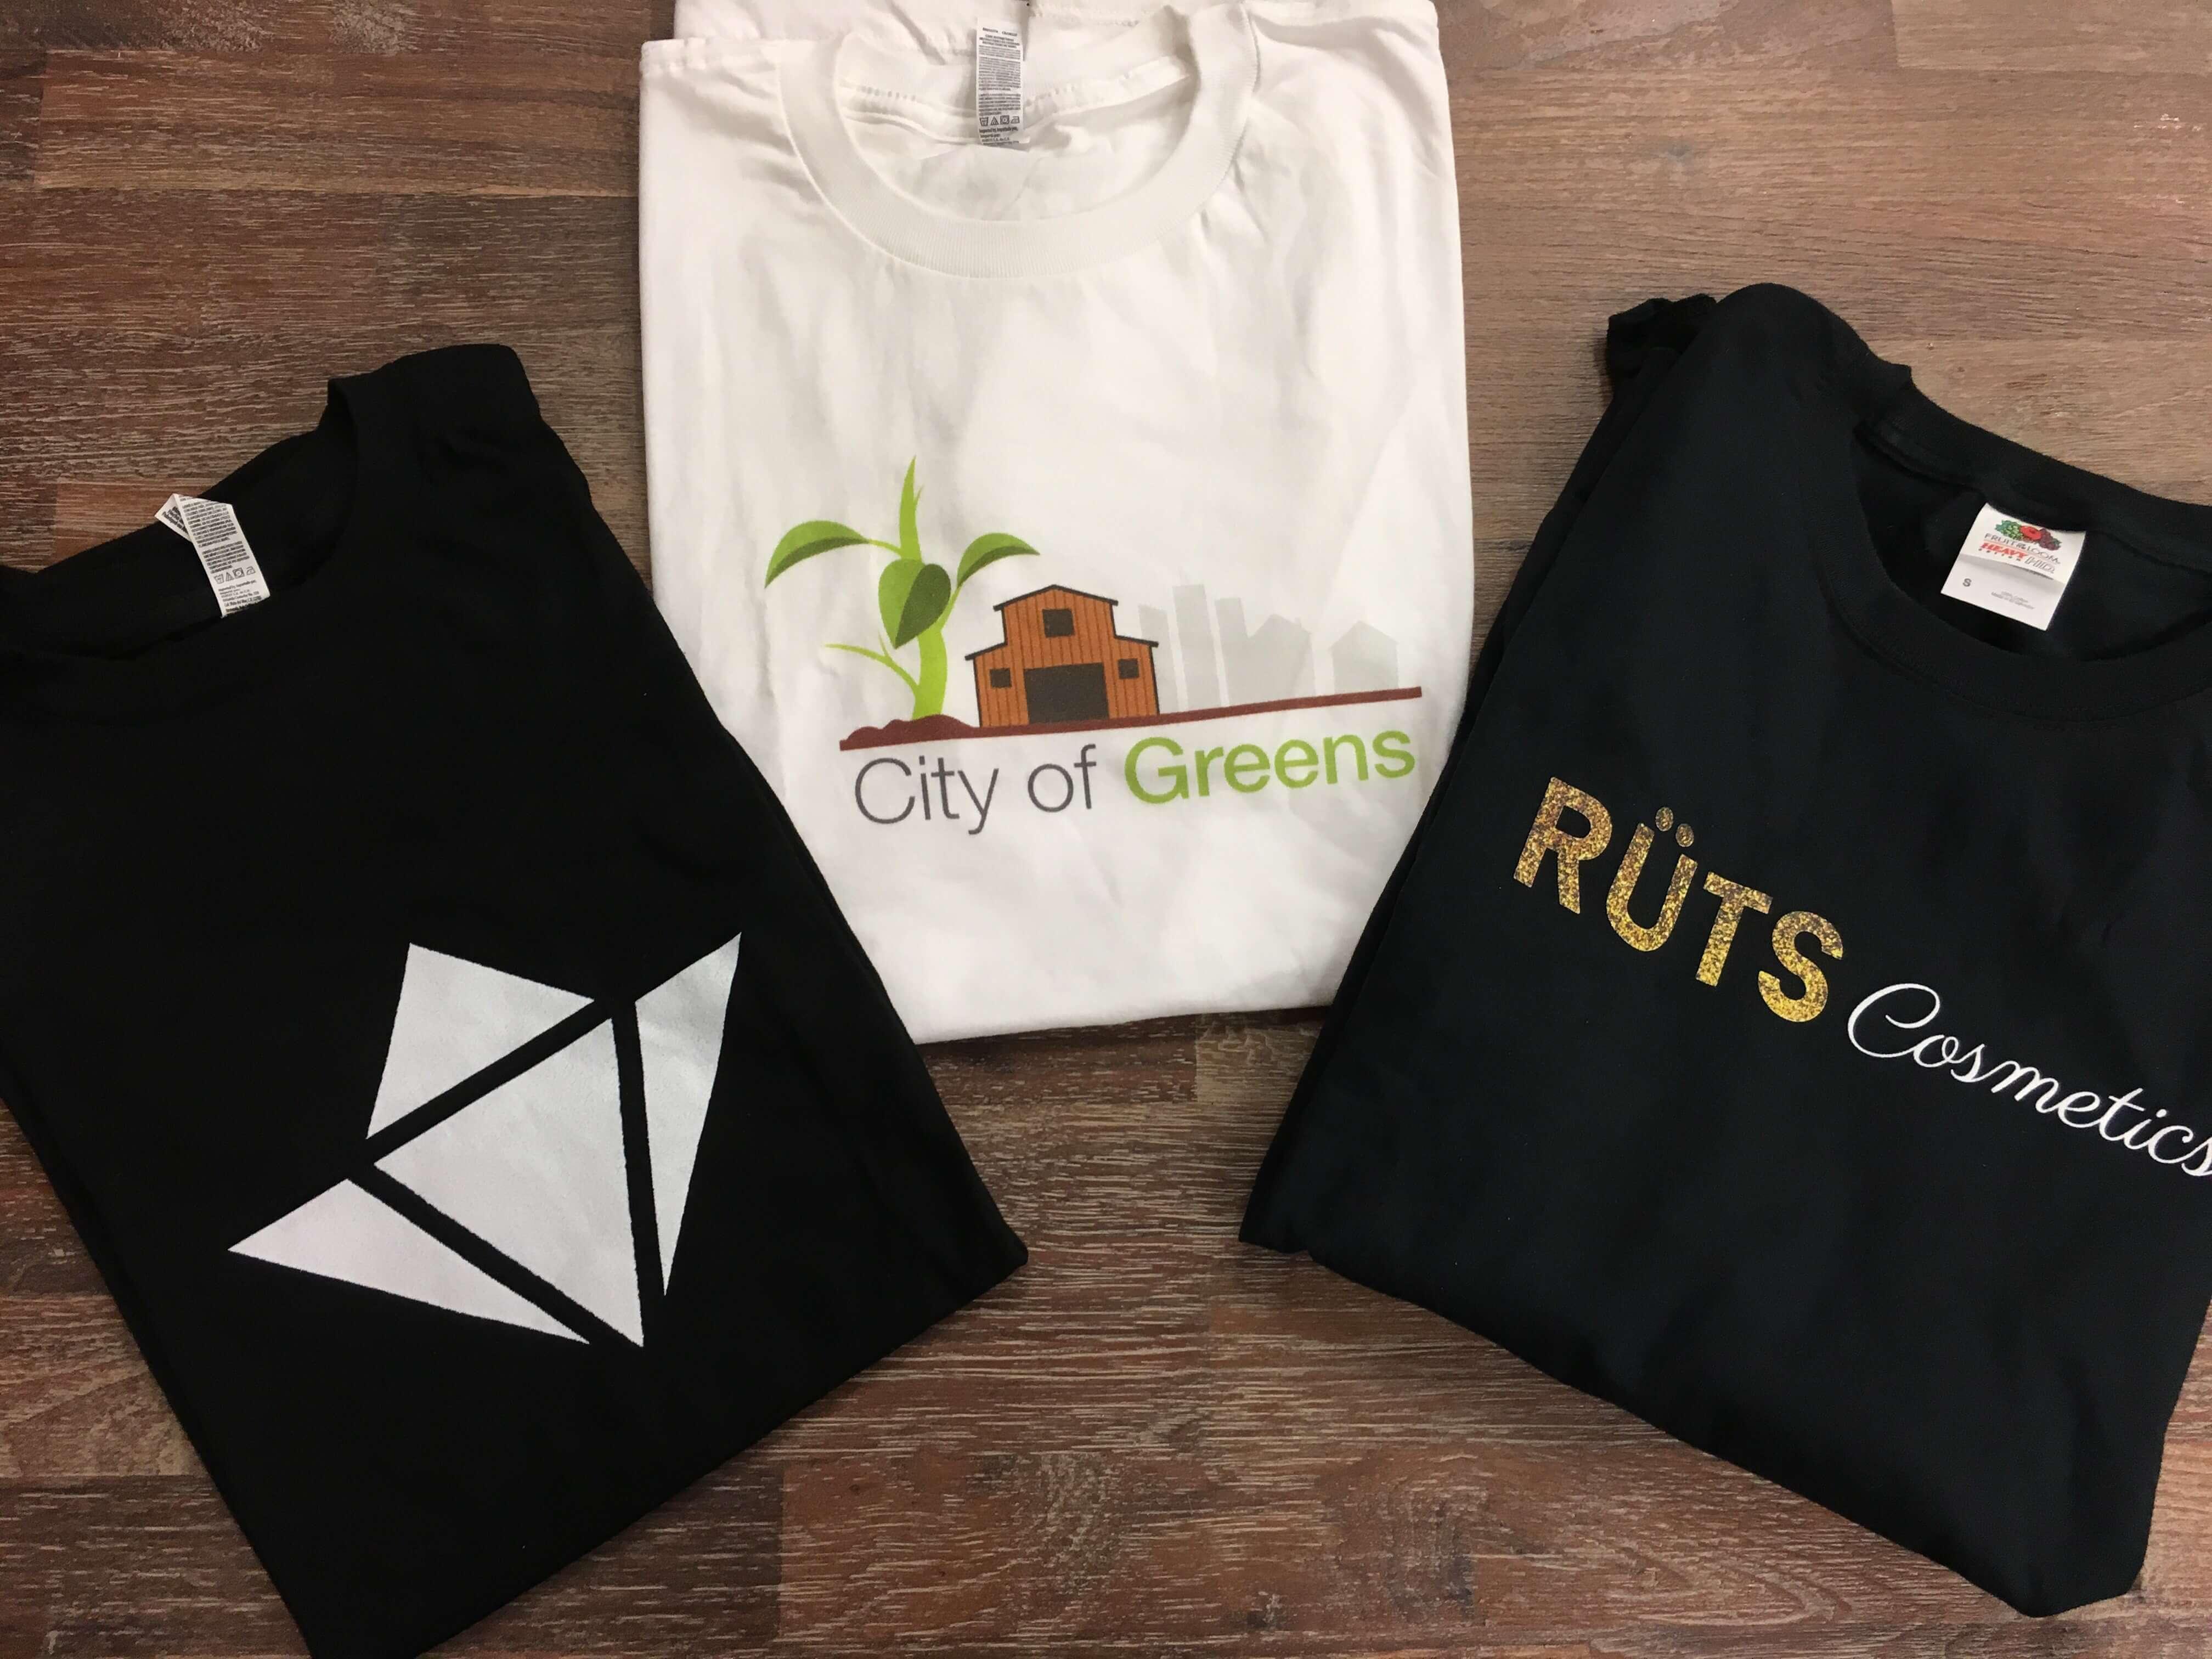 Student company shirts